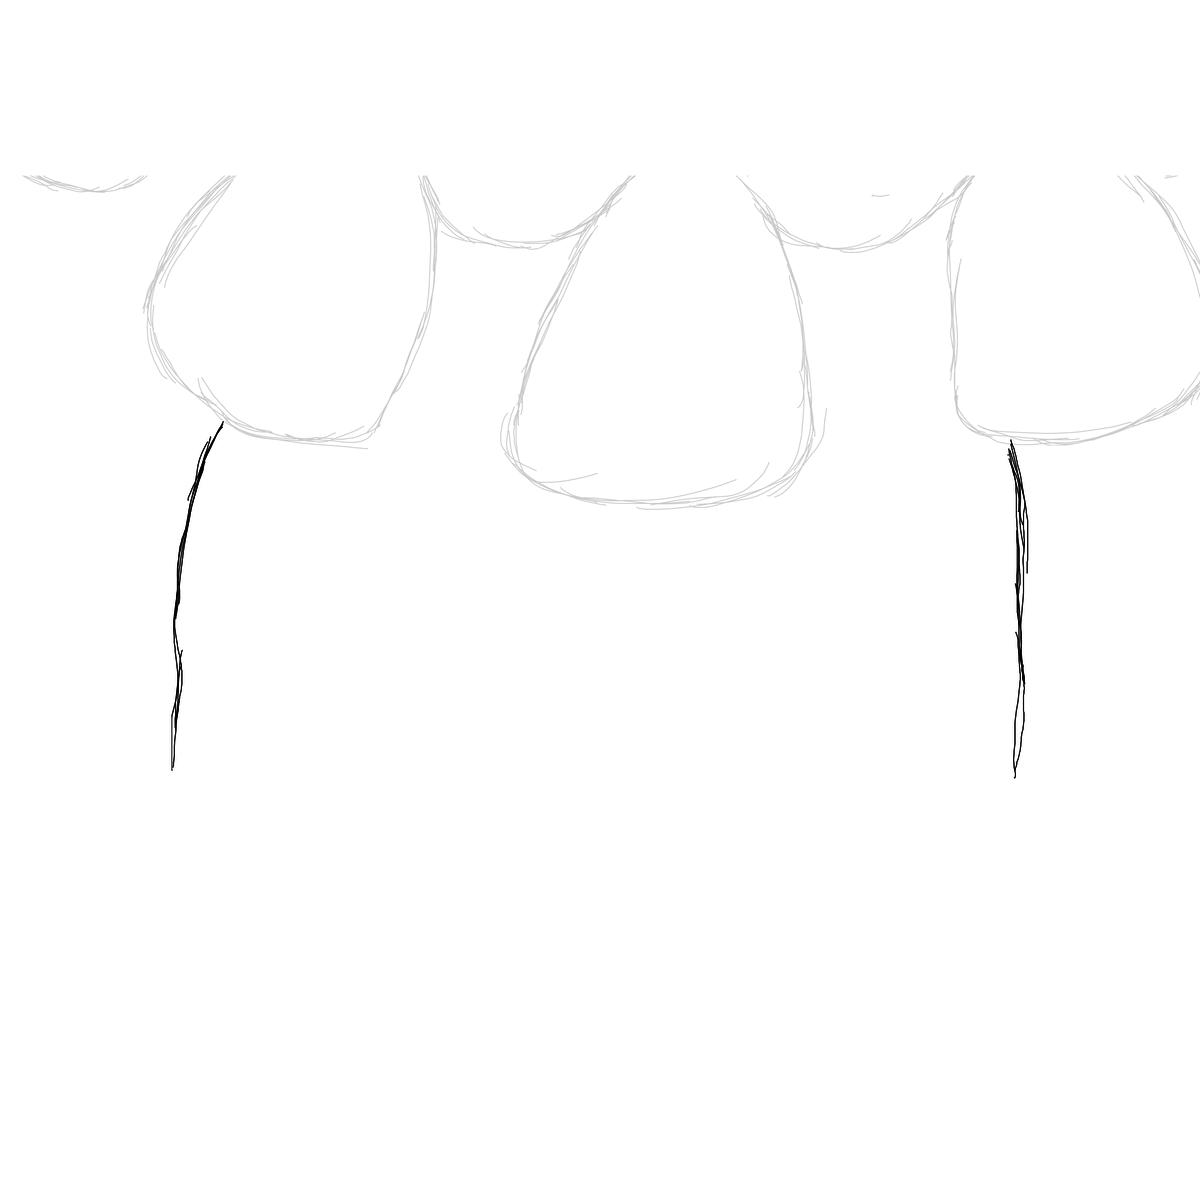 BAAAM drawing#18893 lat:-23.5478363037109380lng: -46.6354866027832000